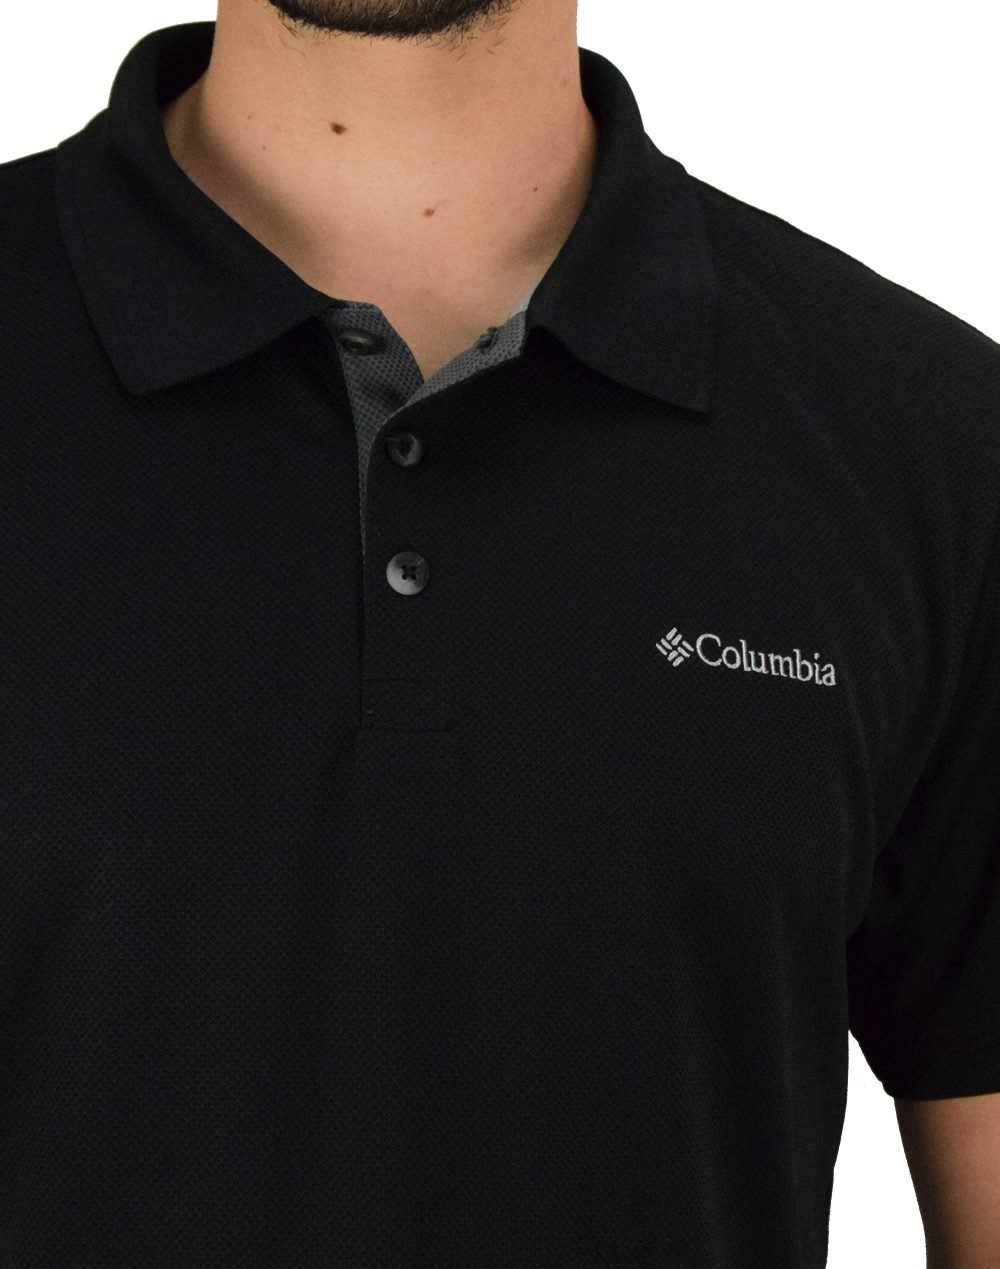 Columbia Utilizer Polo Tee (AM0126-010) Black